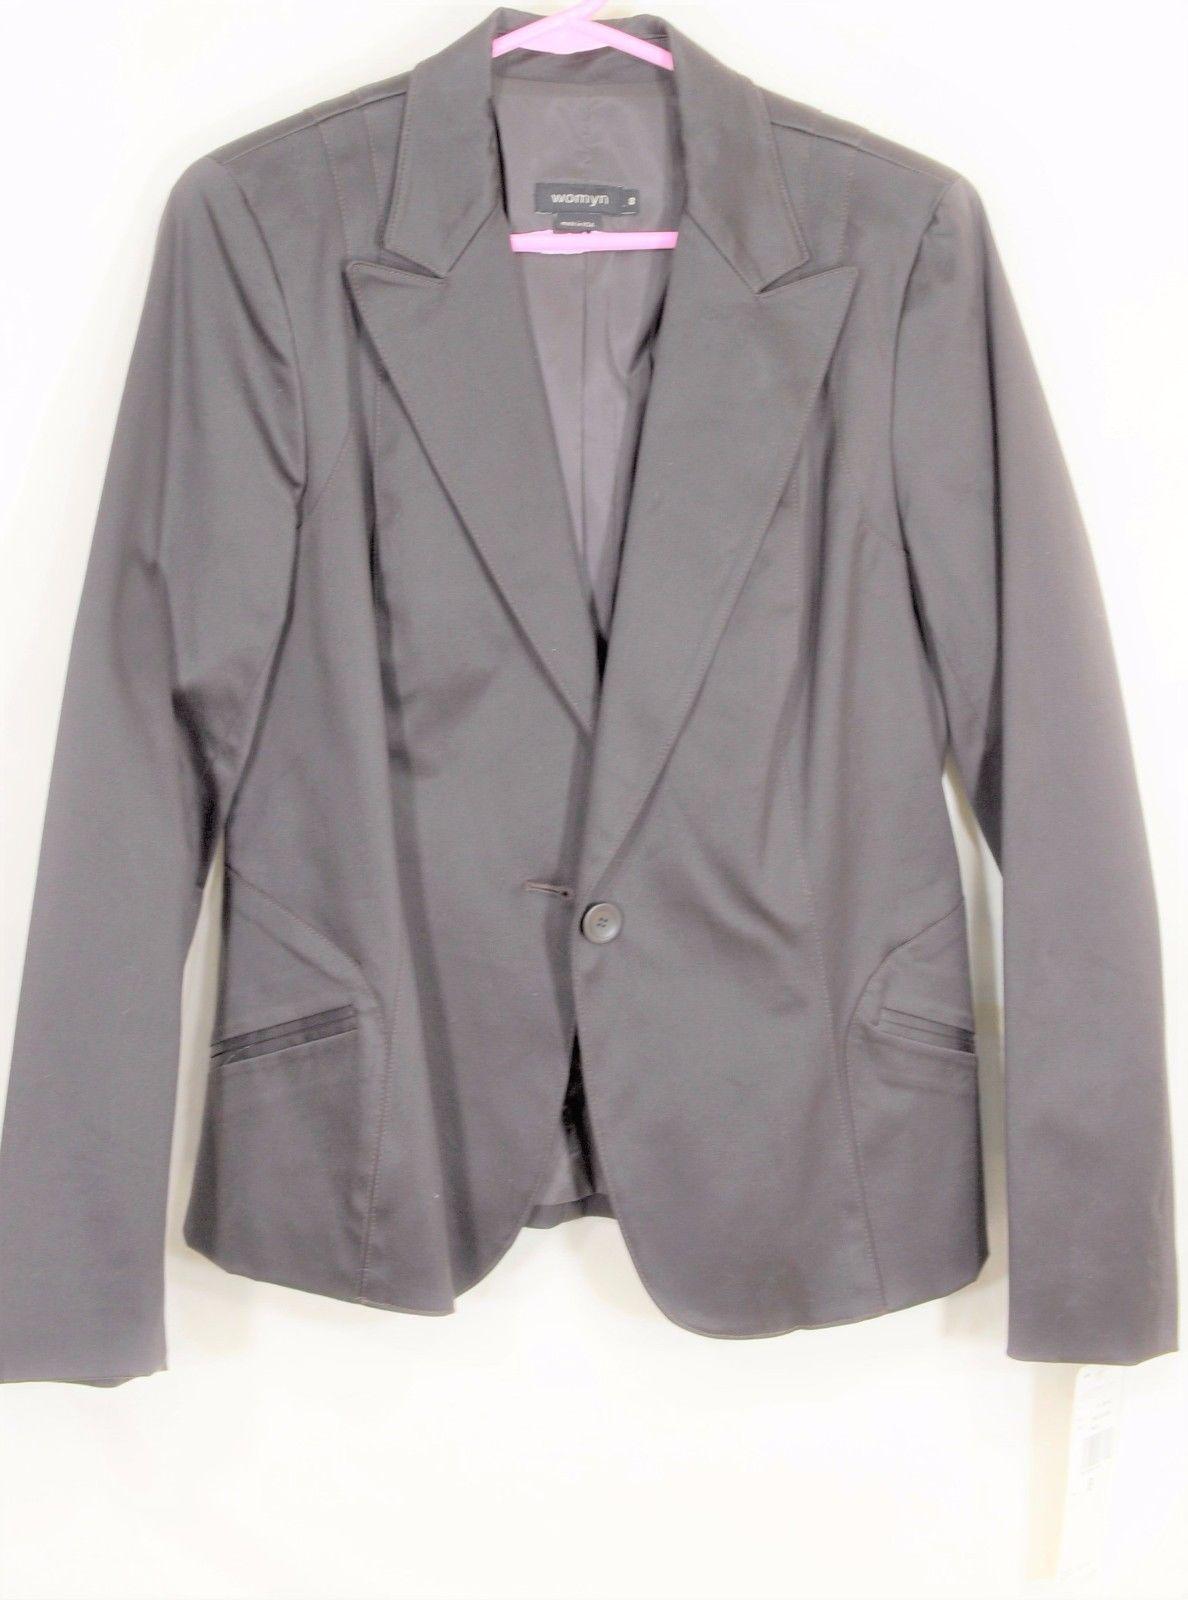 womyn jacket coat NWT SZ 8 dark brown 1-button closure lined NYC USA new image 10